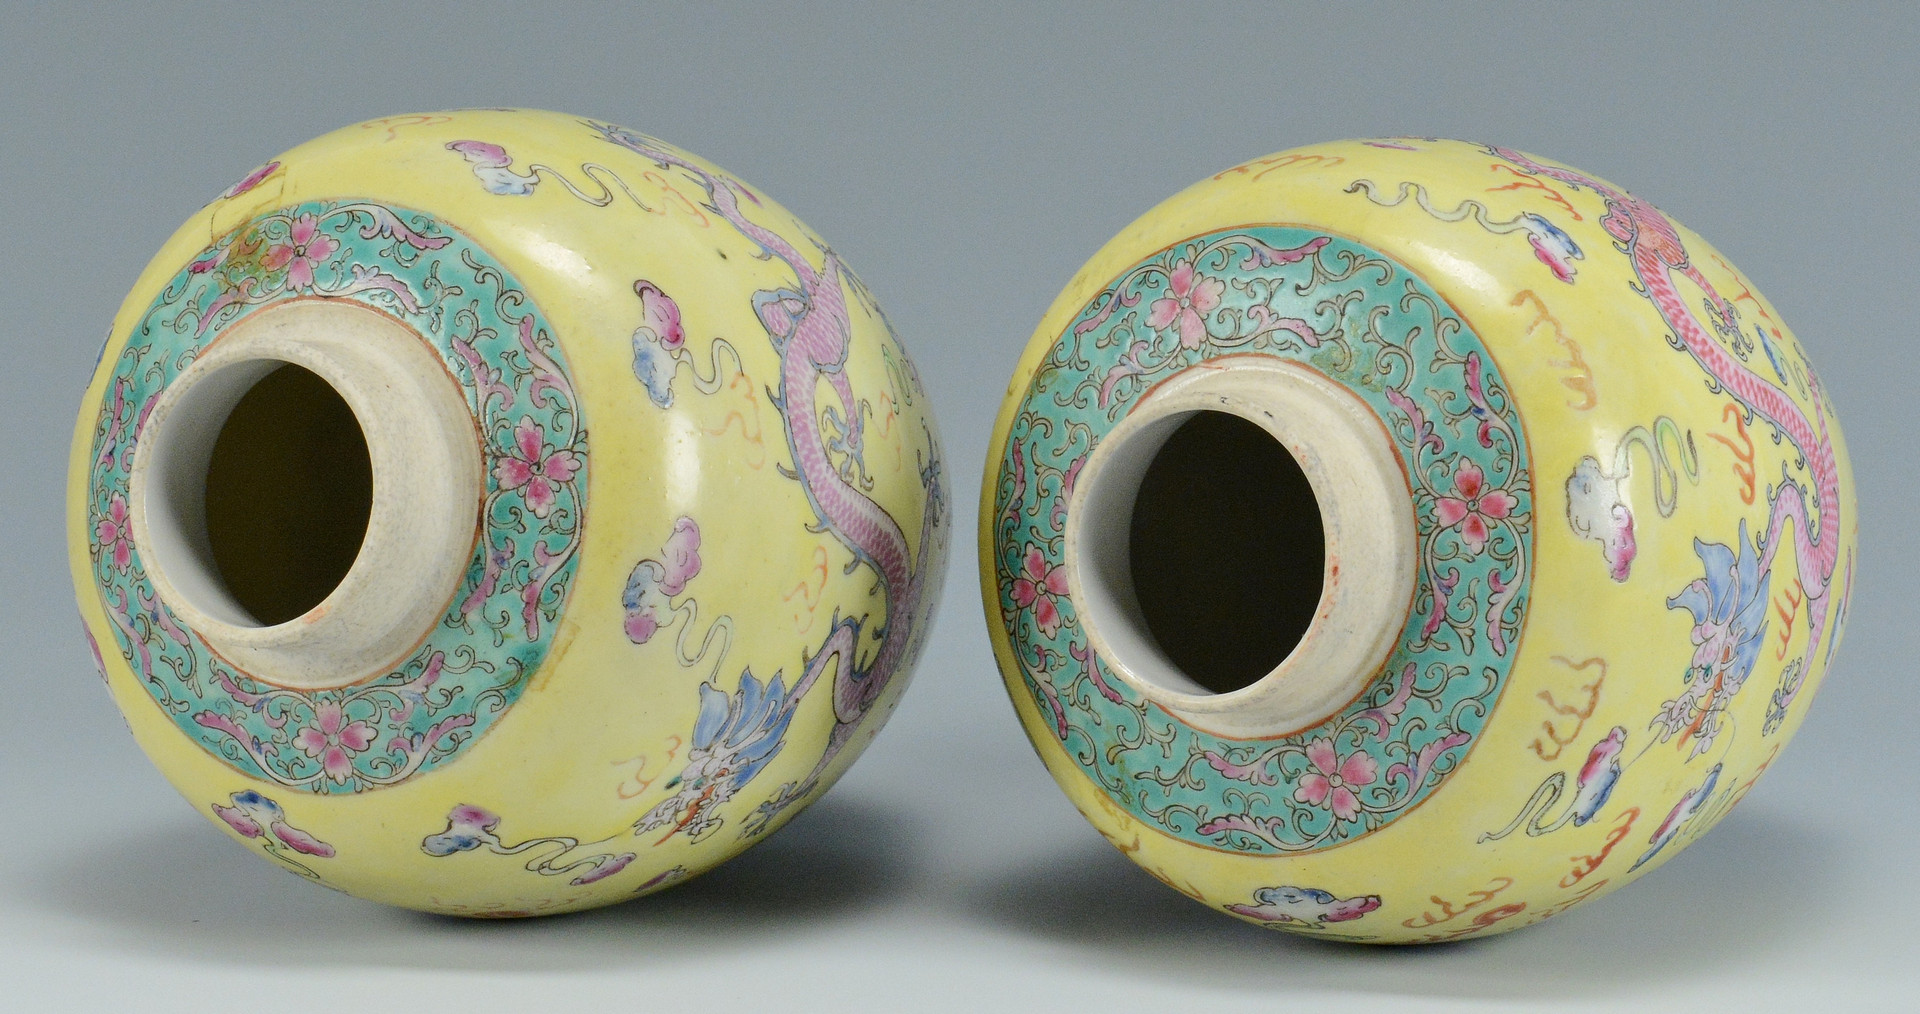 Lot 490: Pr. Chinese Republic Famille Rose Vases